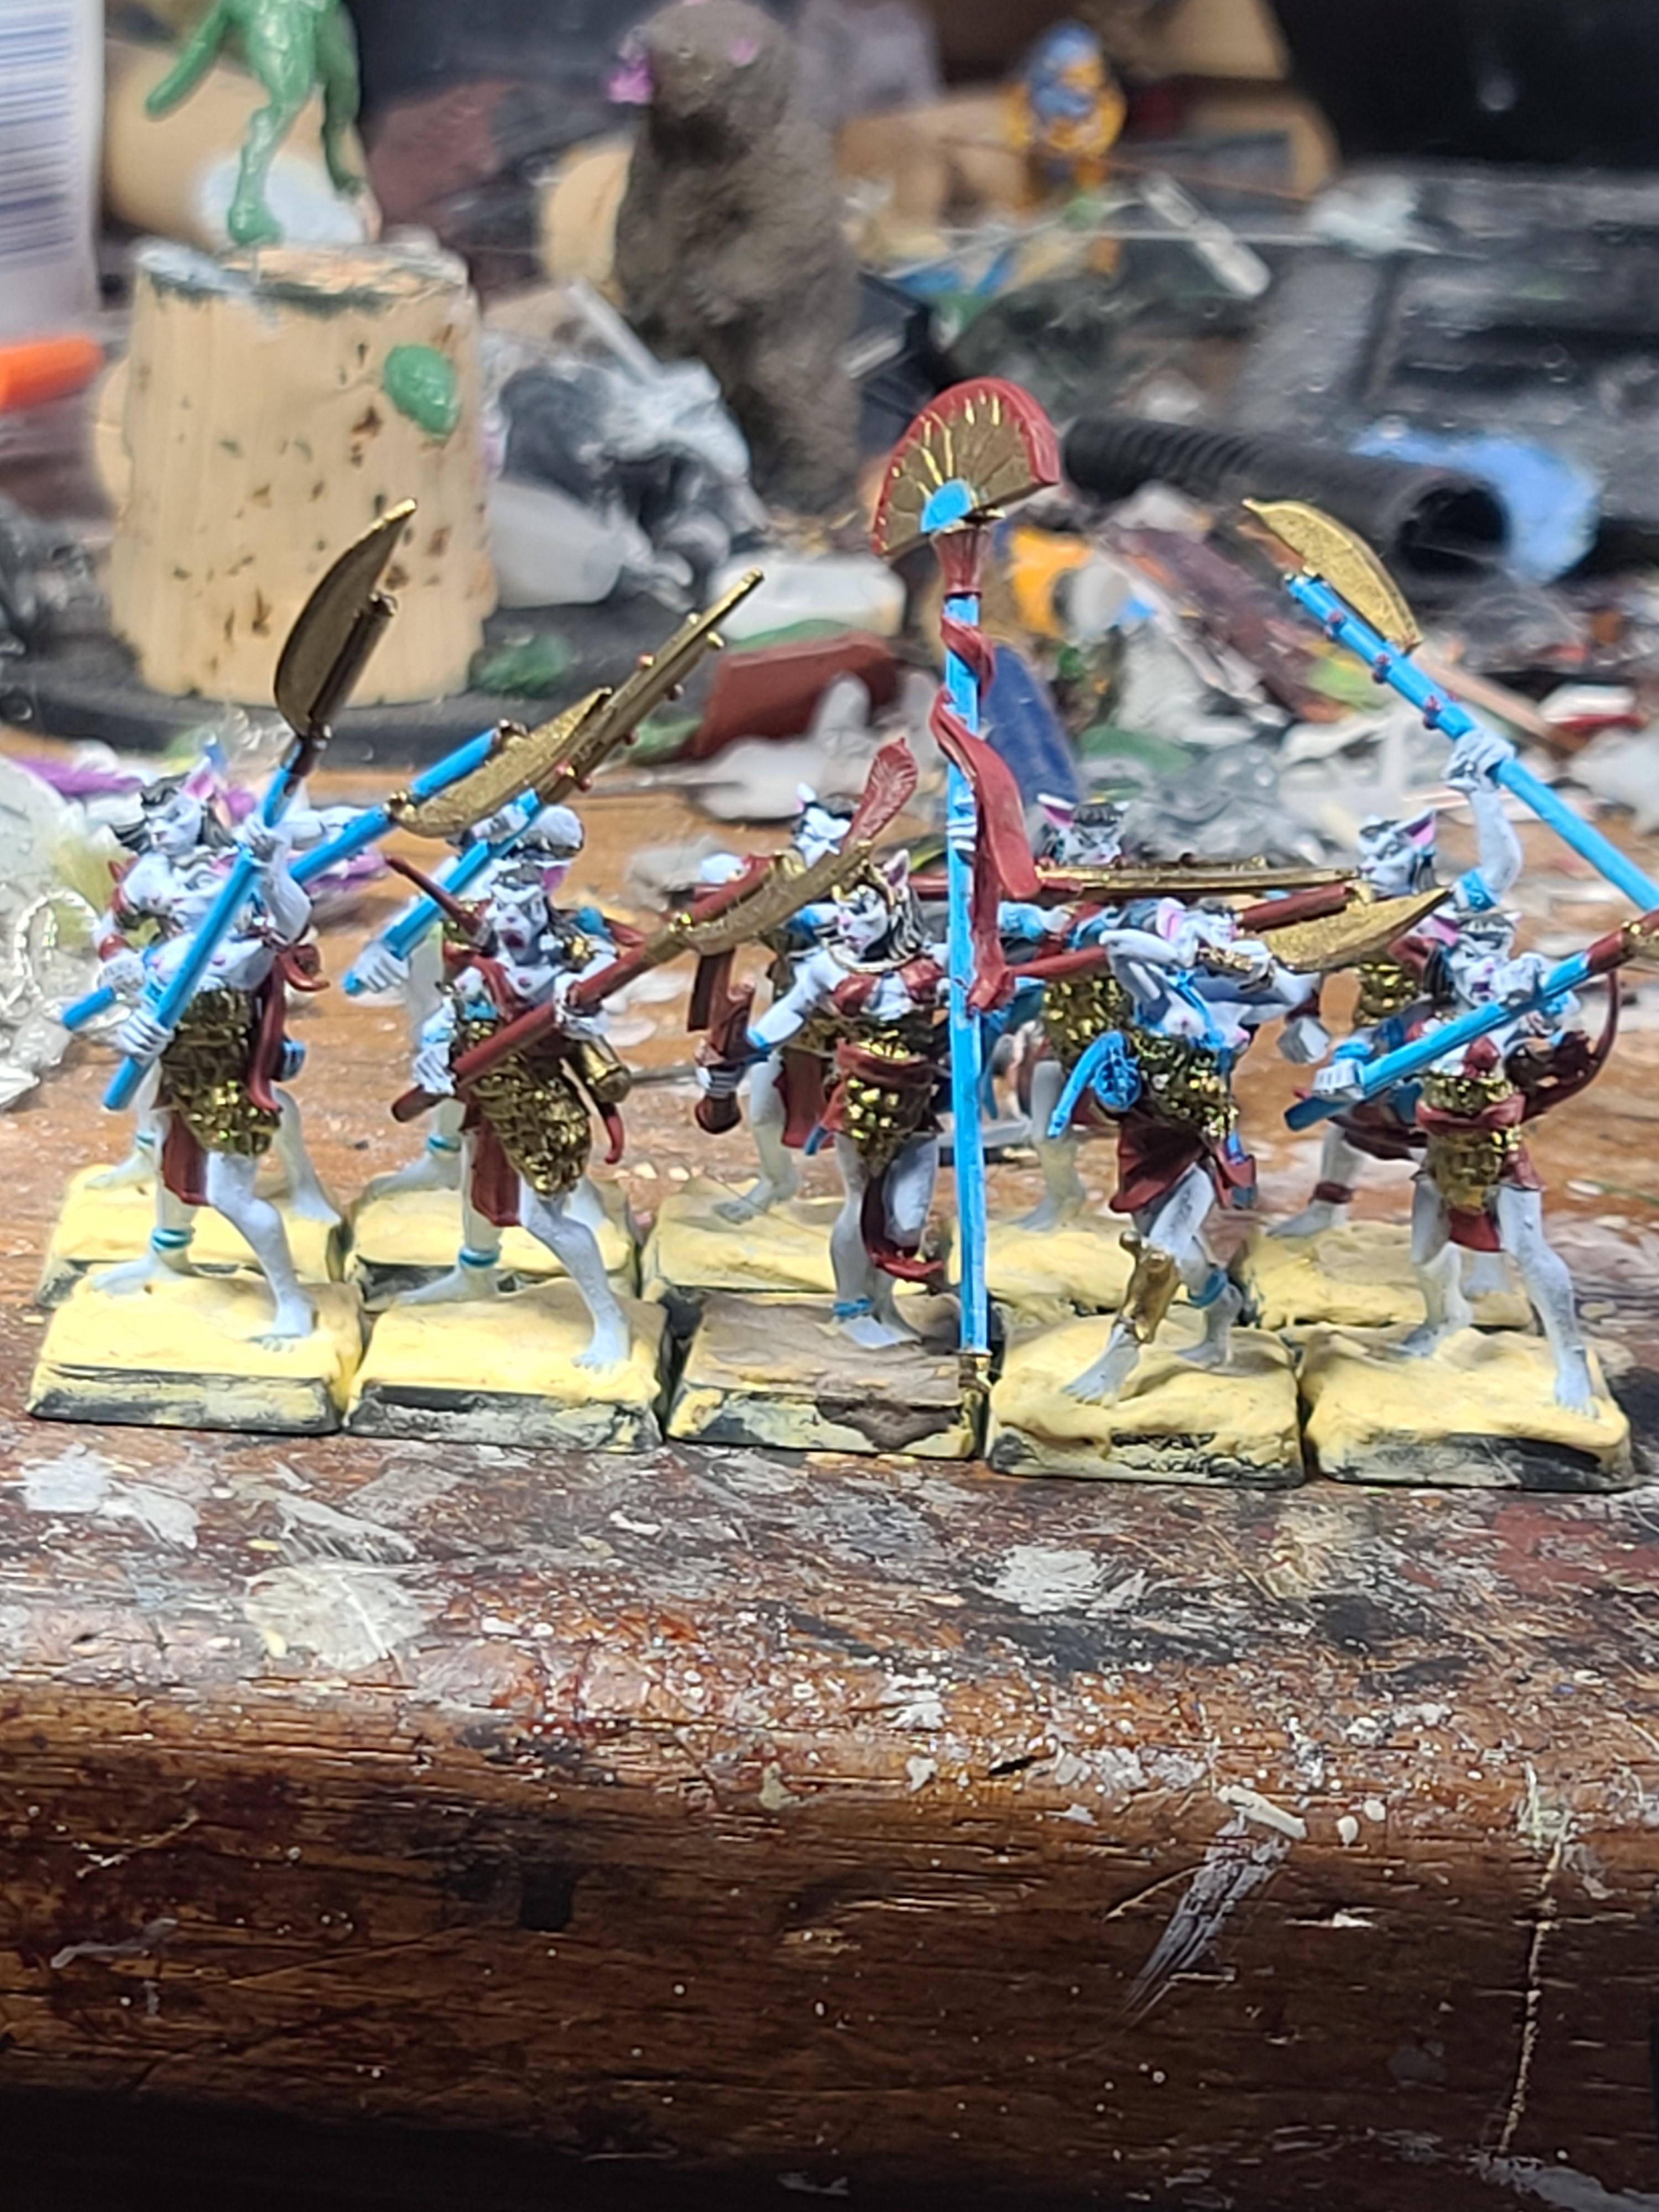 Basti, Bows, Conversion, Crocodile Games, Kitbash, Two Handed Weapons, War Gods Of Aegyptus